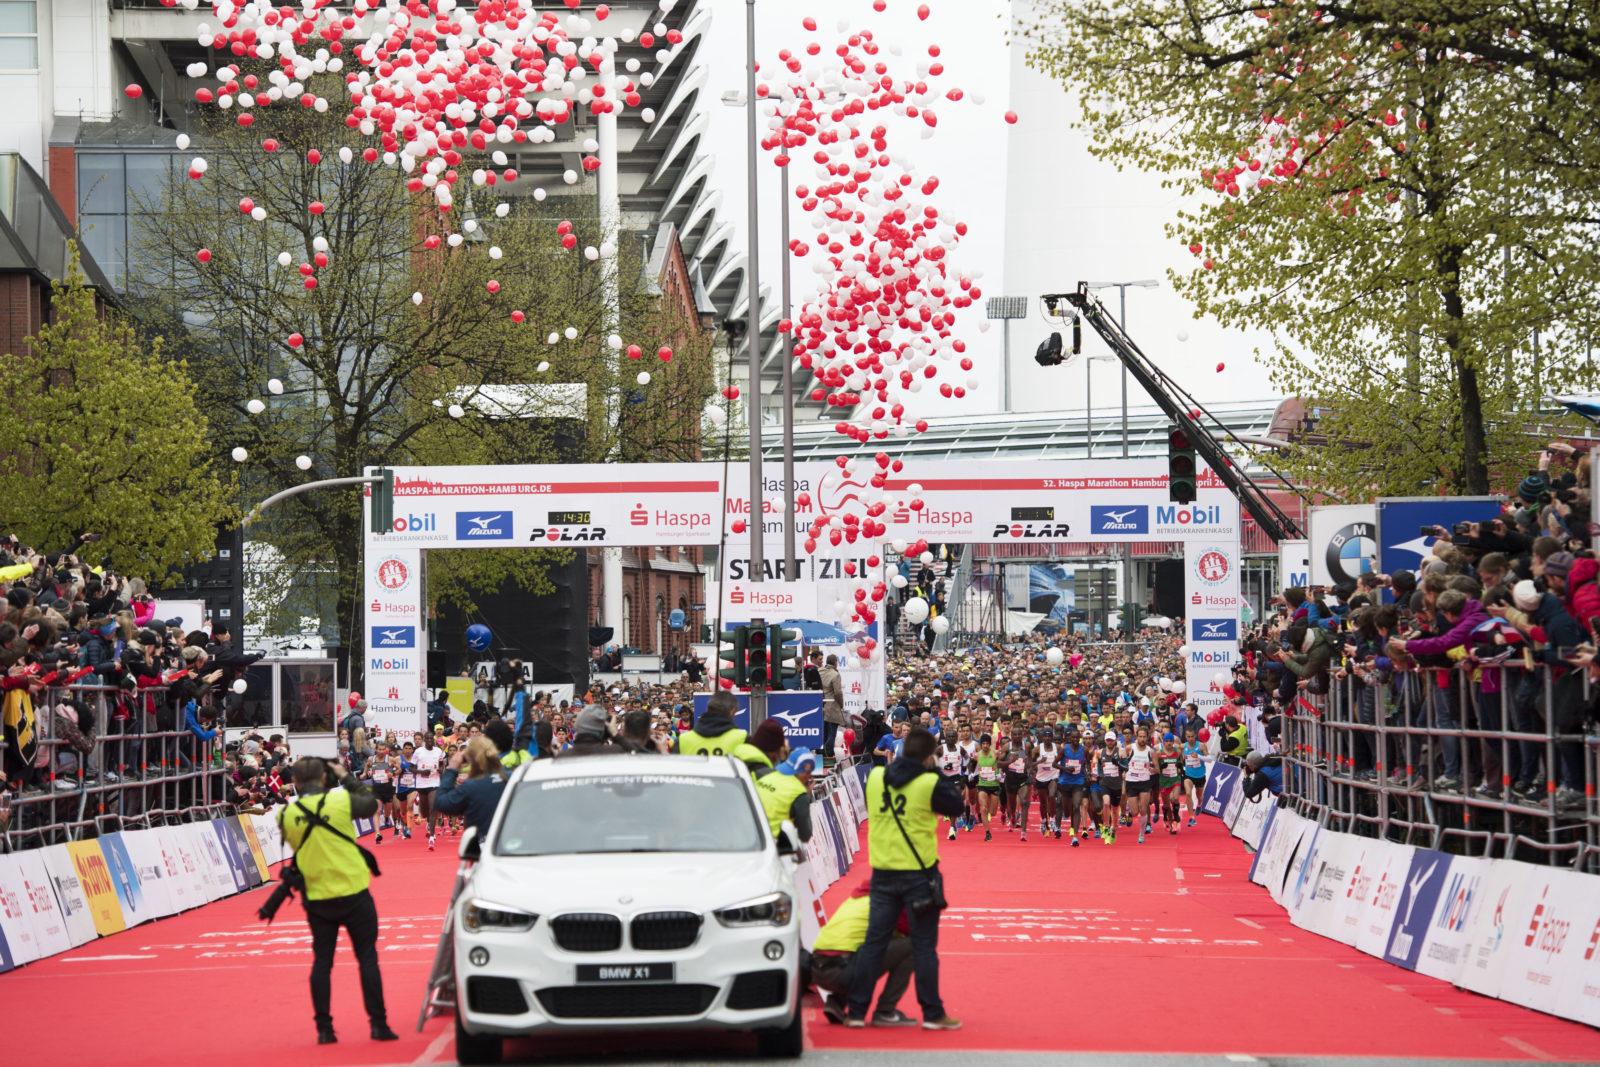 Marathon: Hamburg Marathon 2017